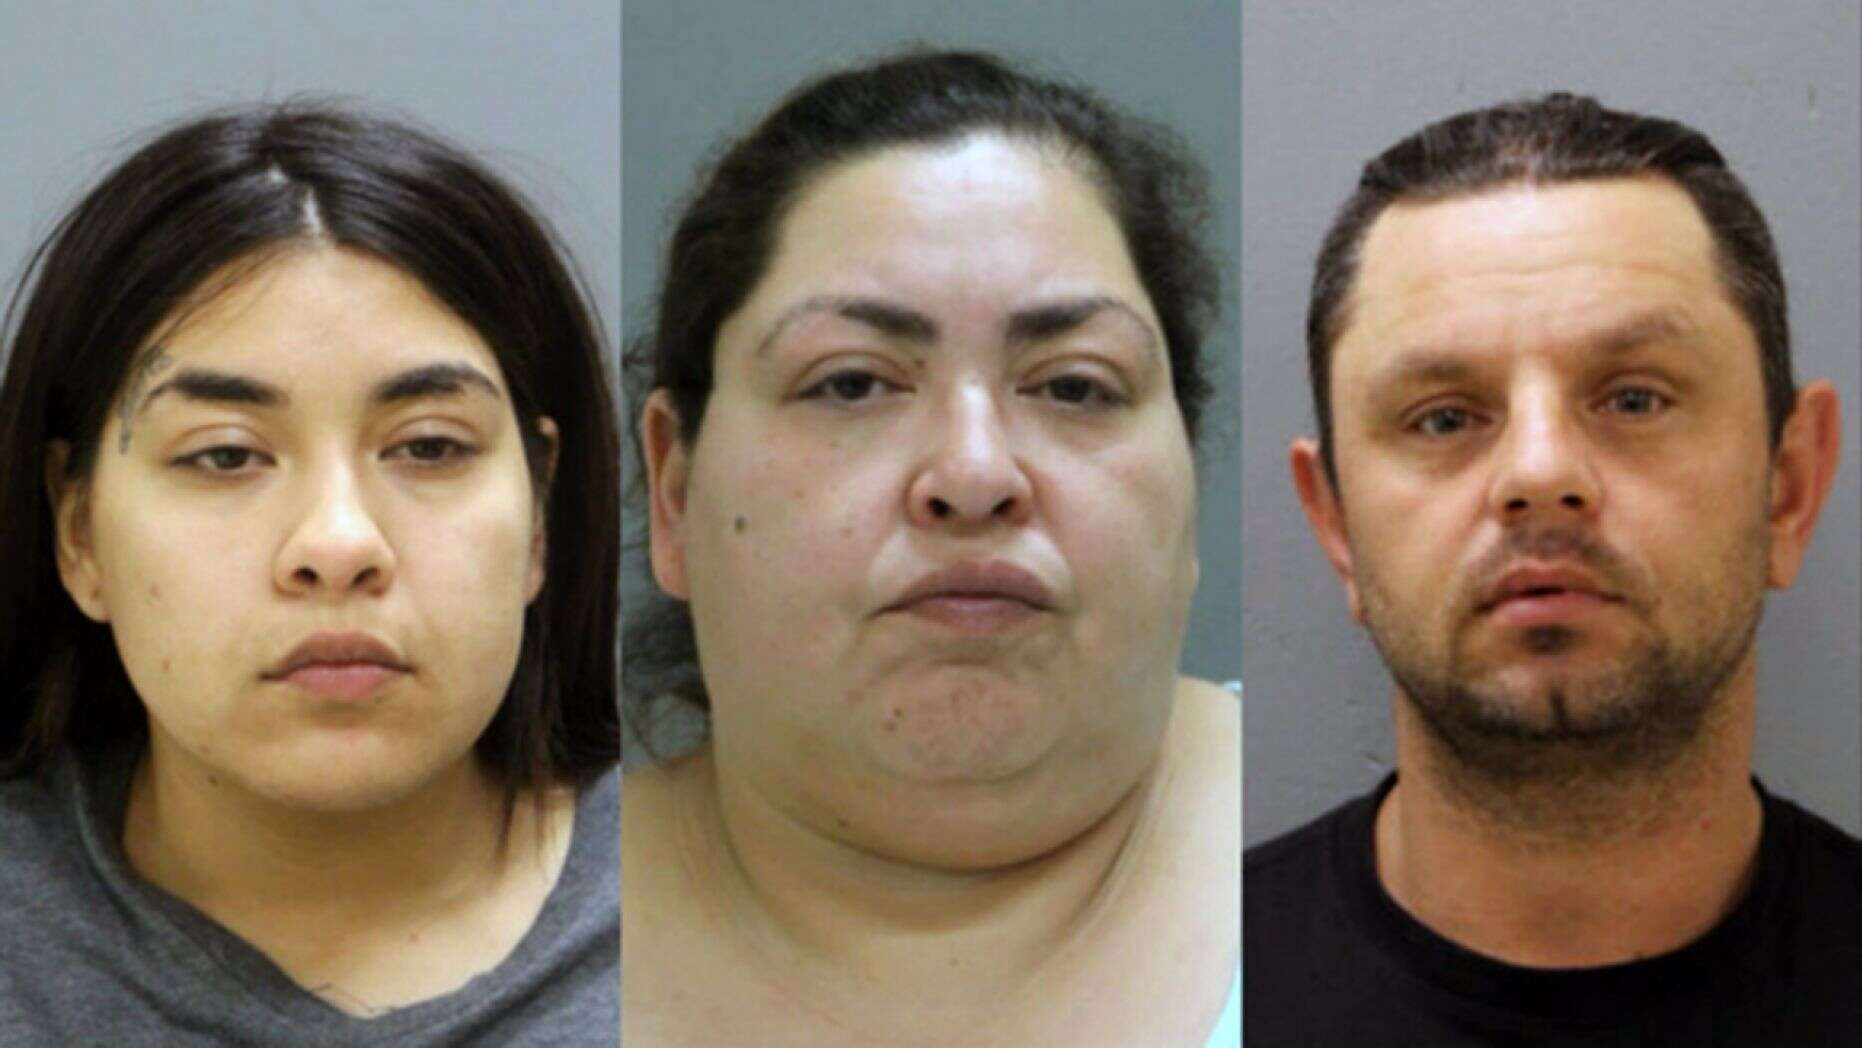 3 People Charged in Slaying of Pregnant Teen Marlen Ochoa